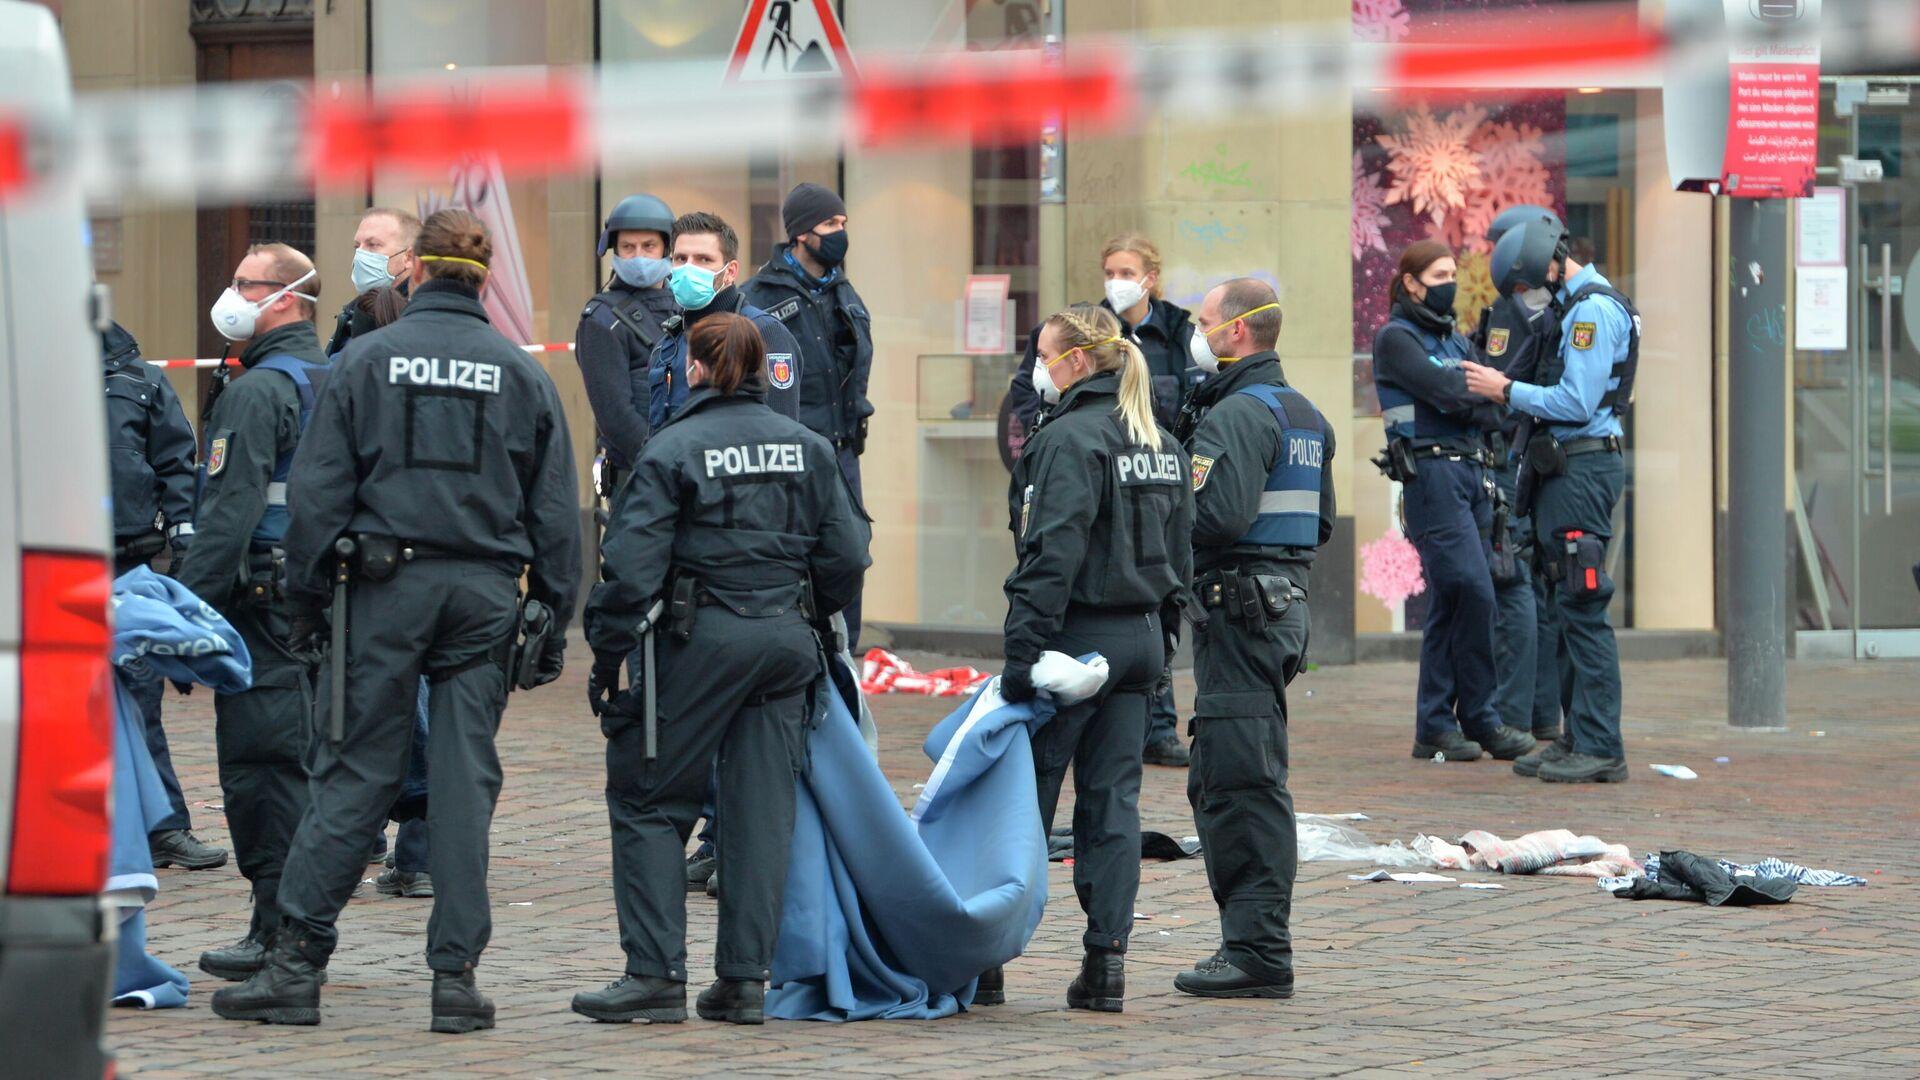 Сотрудники полиции на месте наезда на пешеходов в городе Трир, Германия - РИА Новости, 1920, 01.12.2020